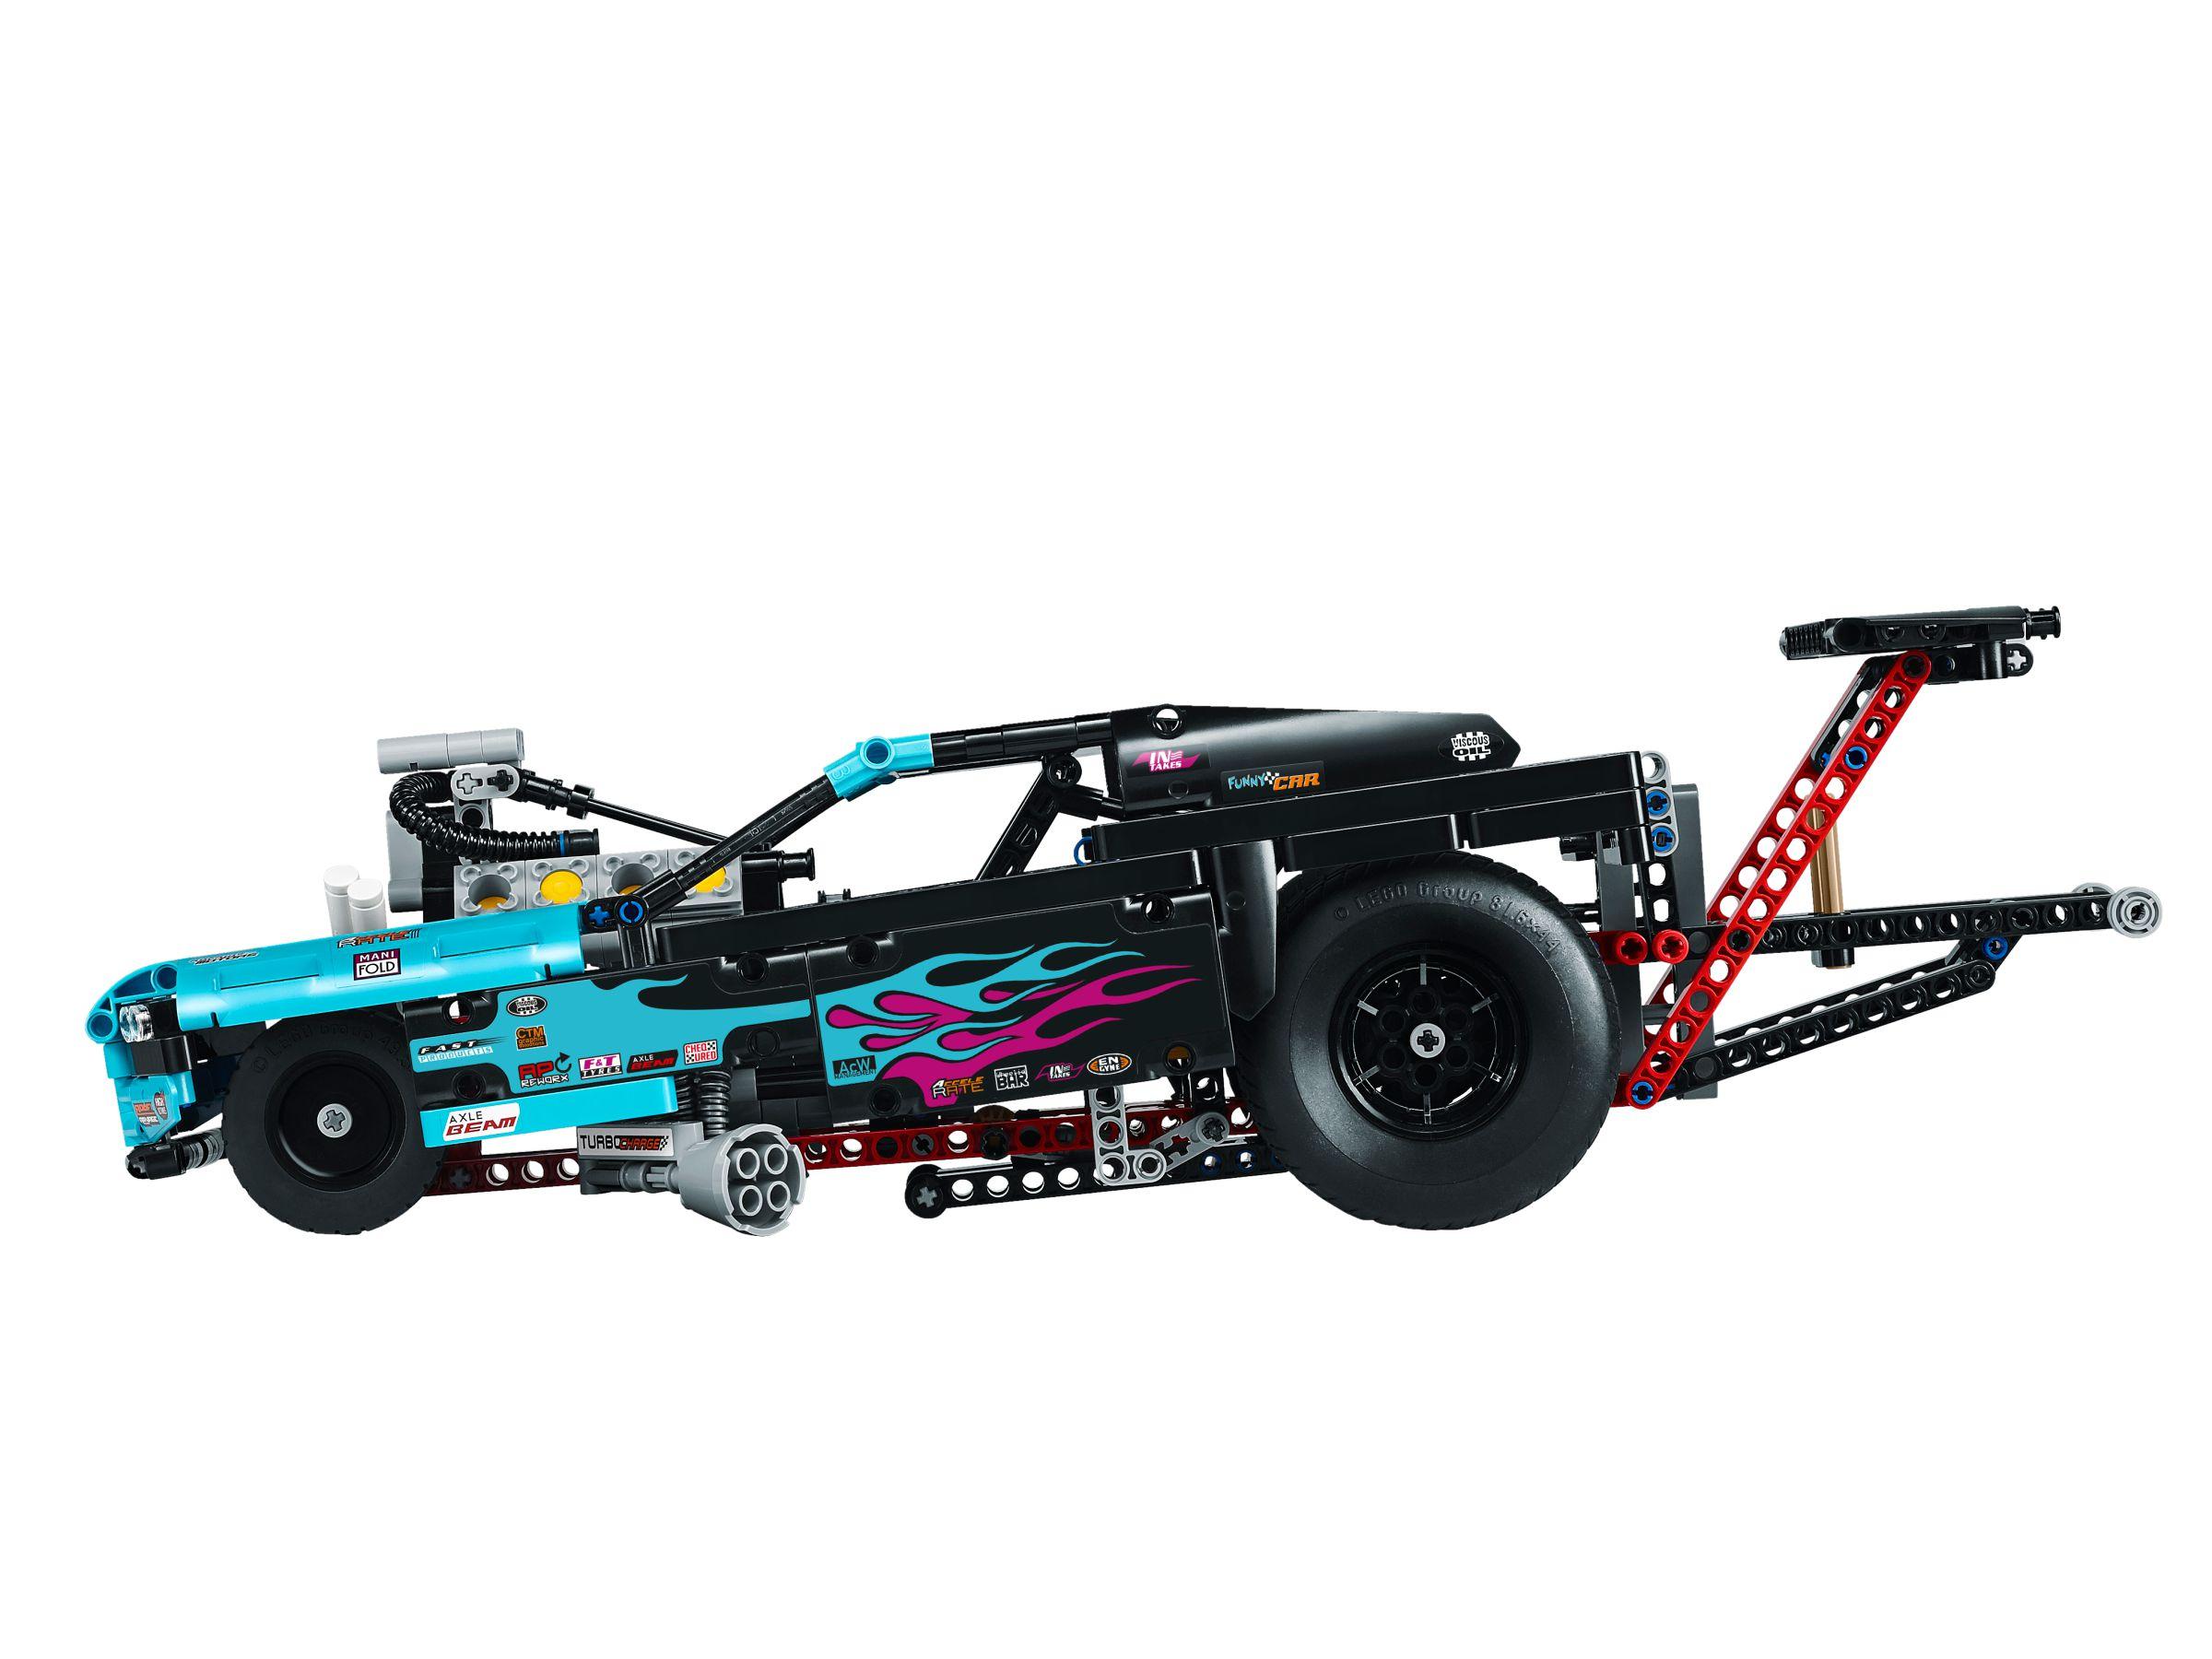 drag racer 42050 lego technic 2016 im preisvergleich. Black Bedroom Furniture Sets. Home Design Ideas